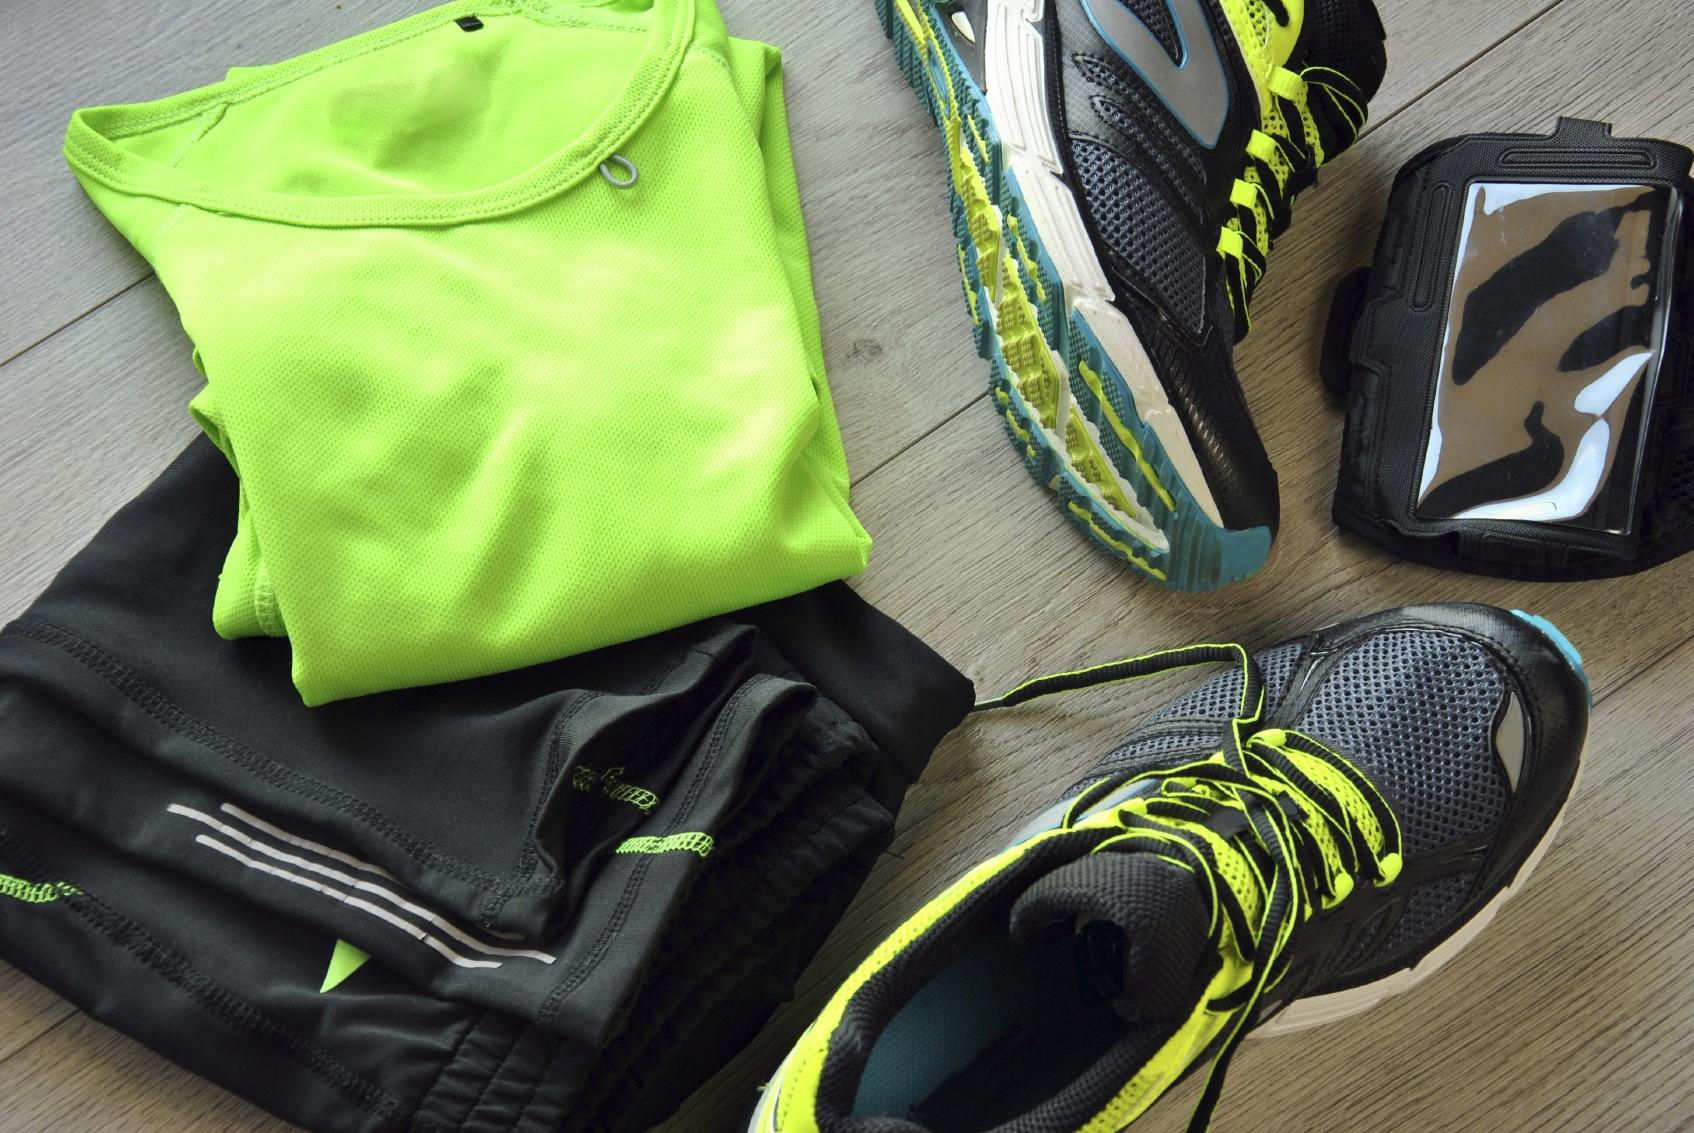 image: istockphoto.com/istockphotoluis